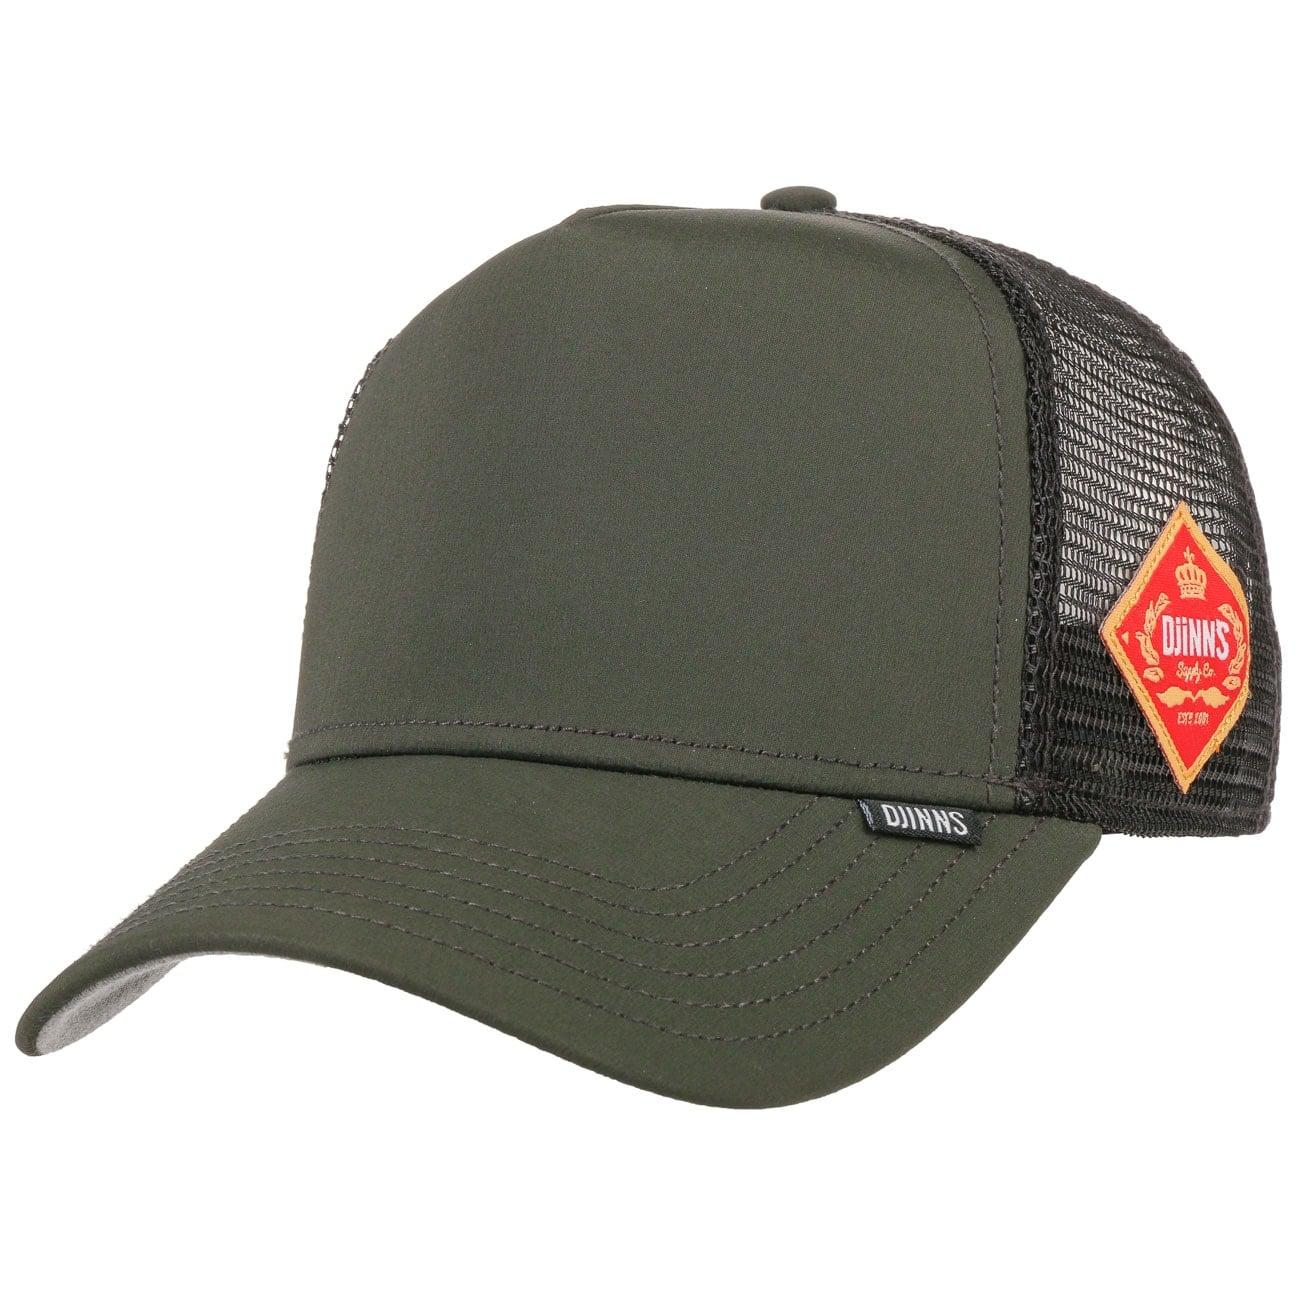 hft-cigar-trucker-cap-by-djinns-basecap